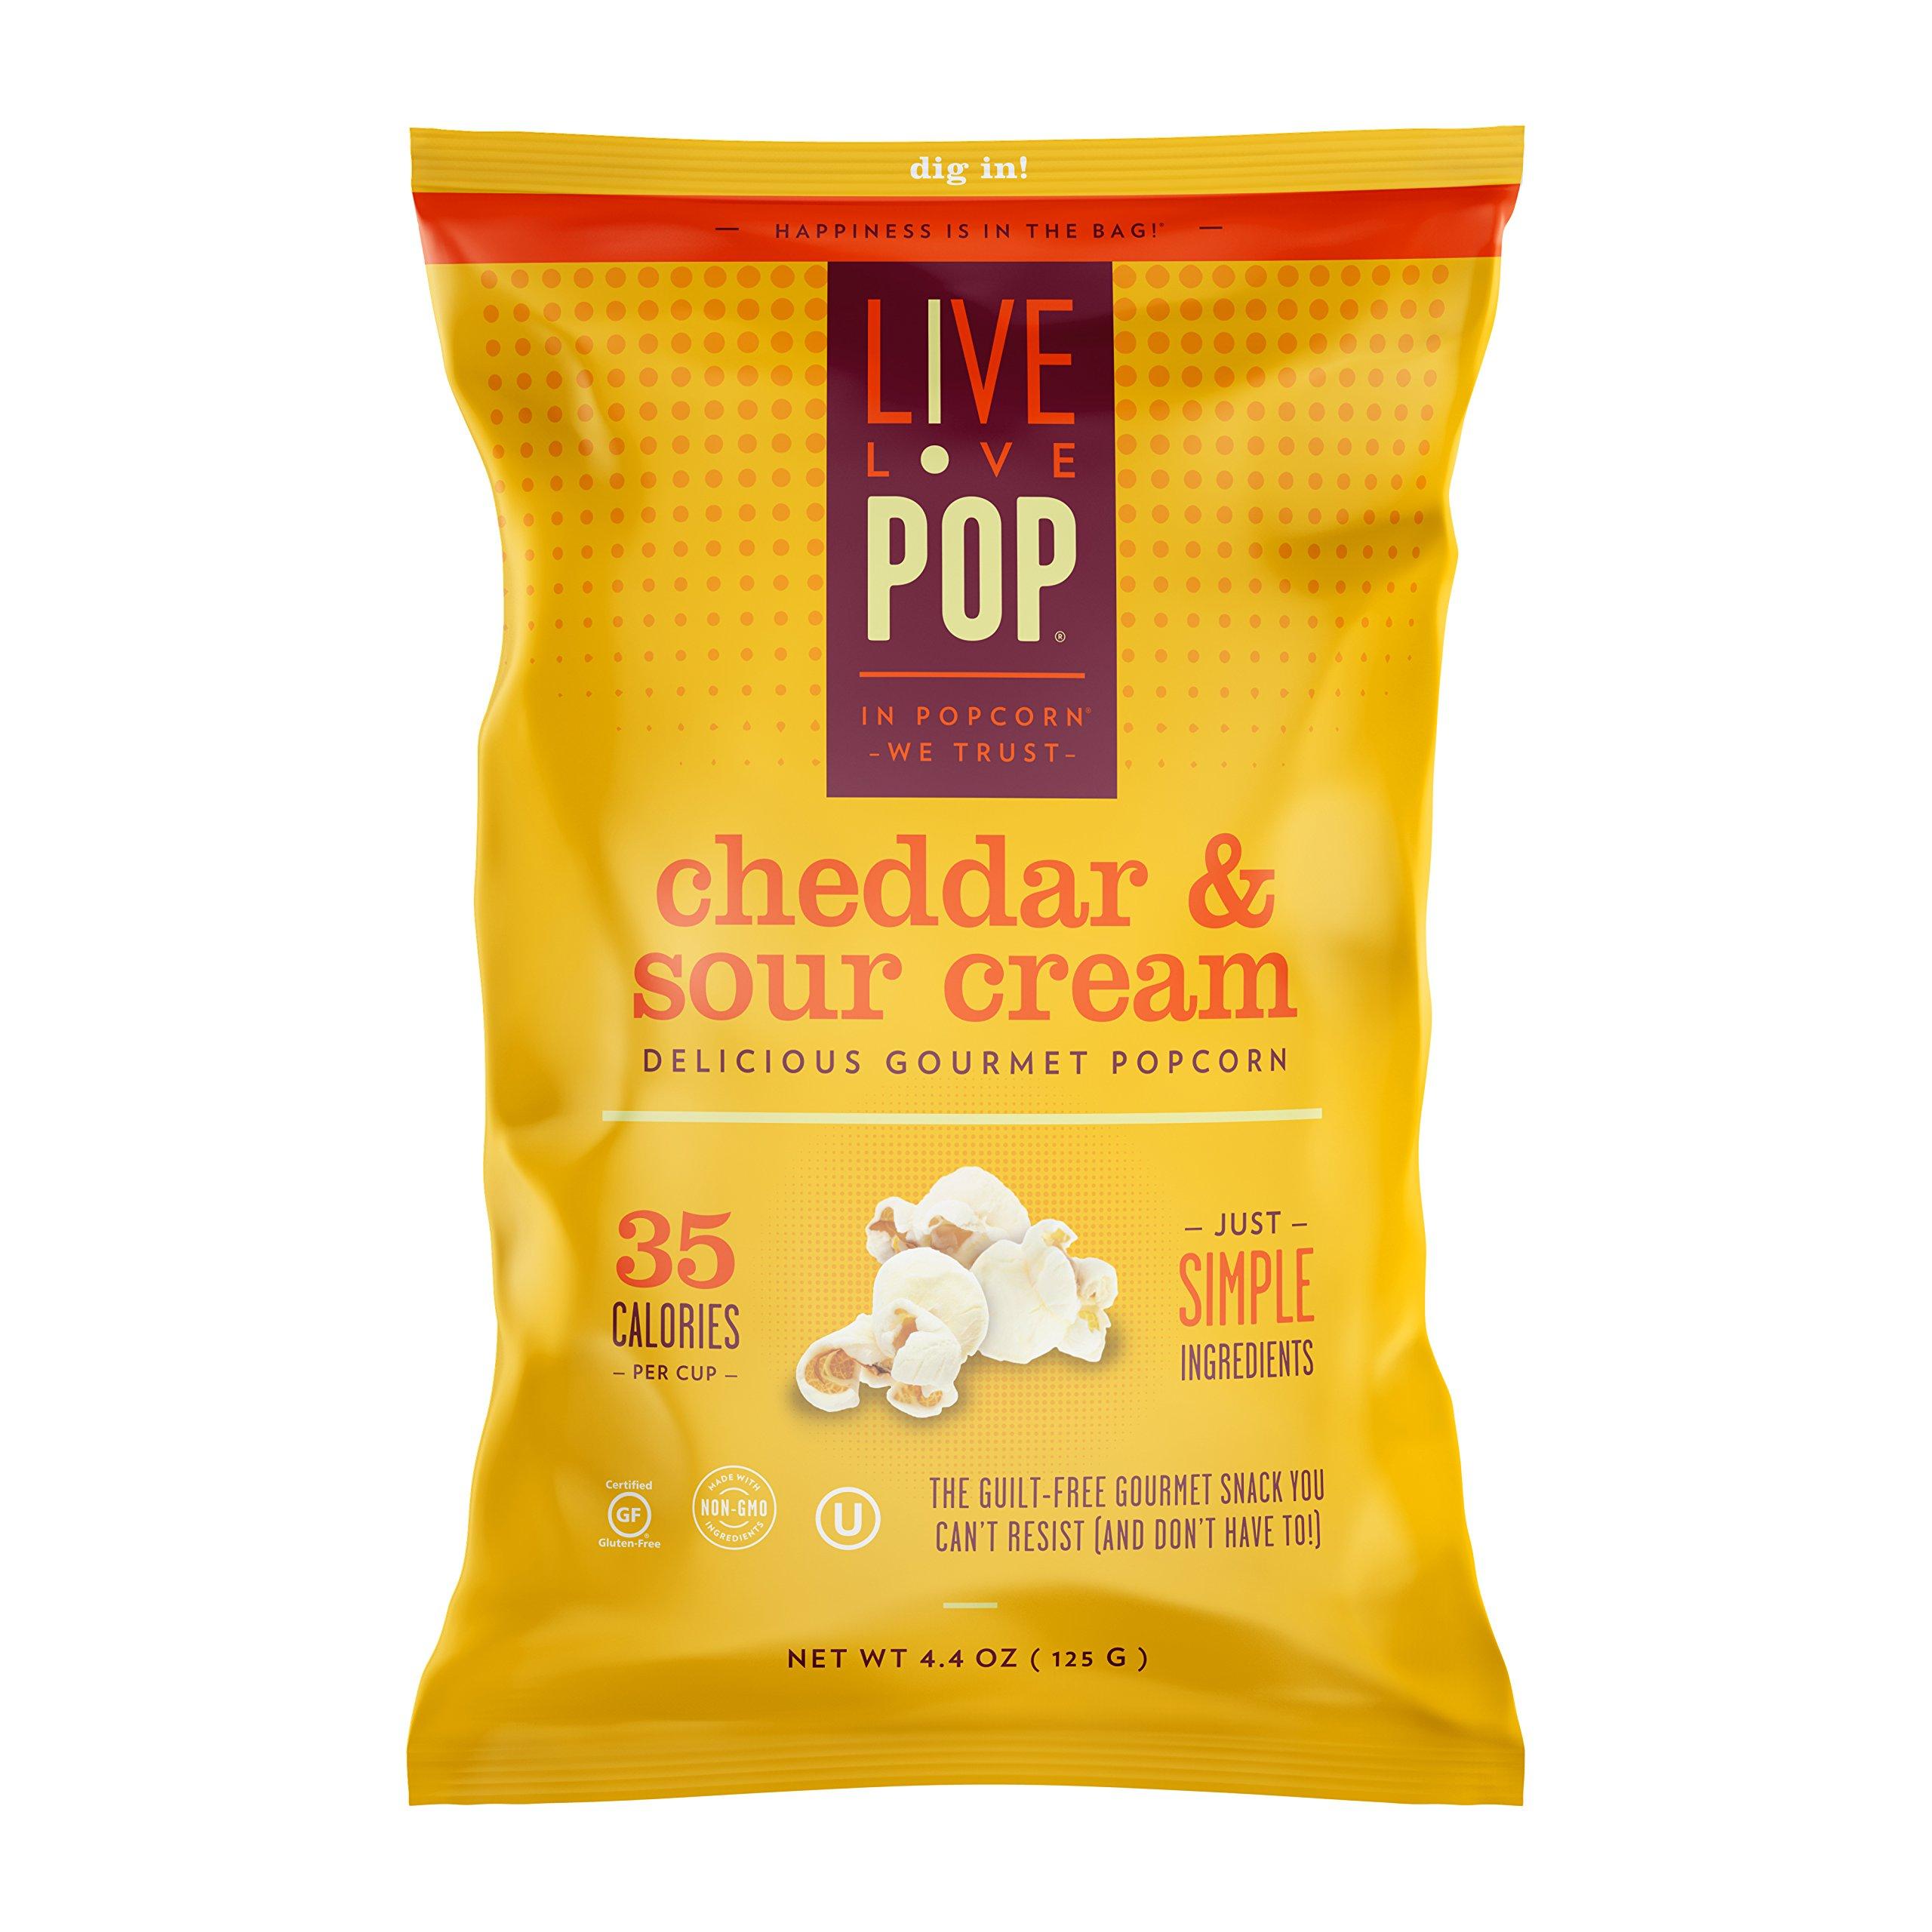 Live Love Pop Cheddar & Sour Cream Popcorn 4.4 oz. (12 pack)